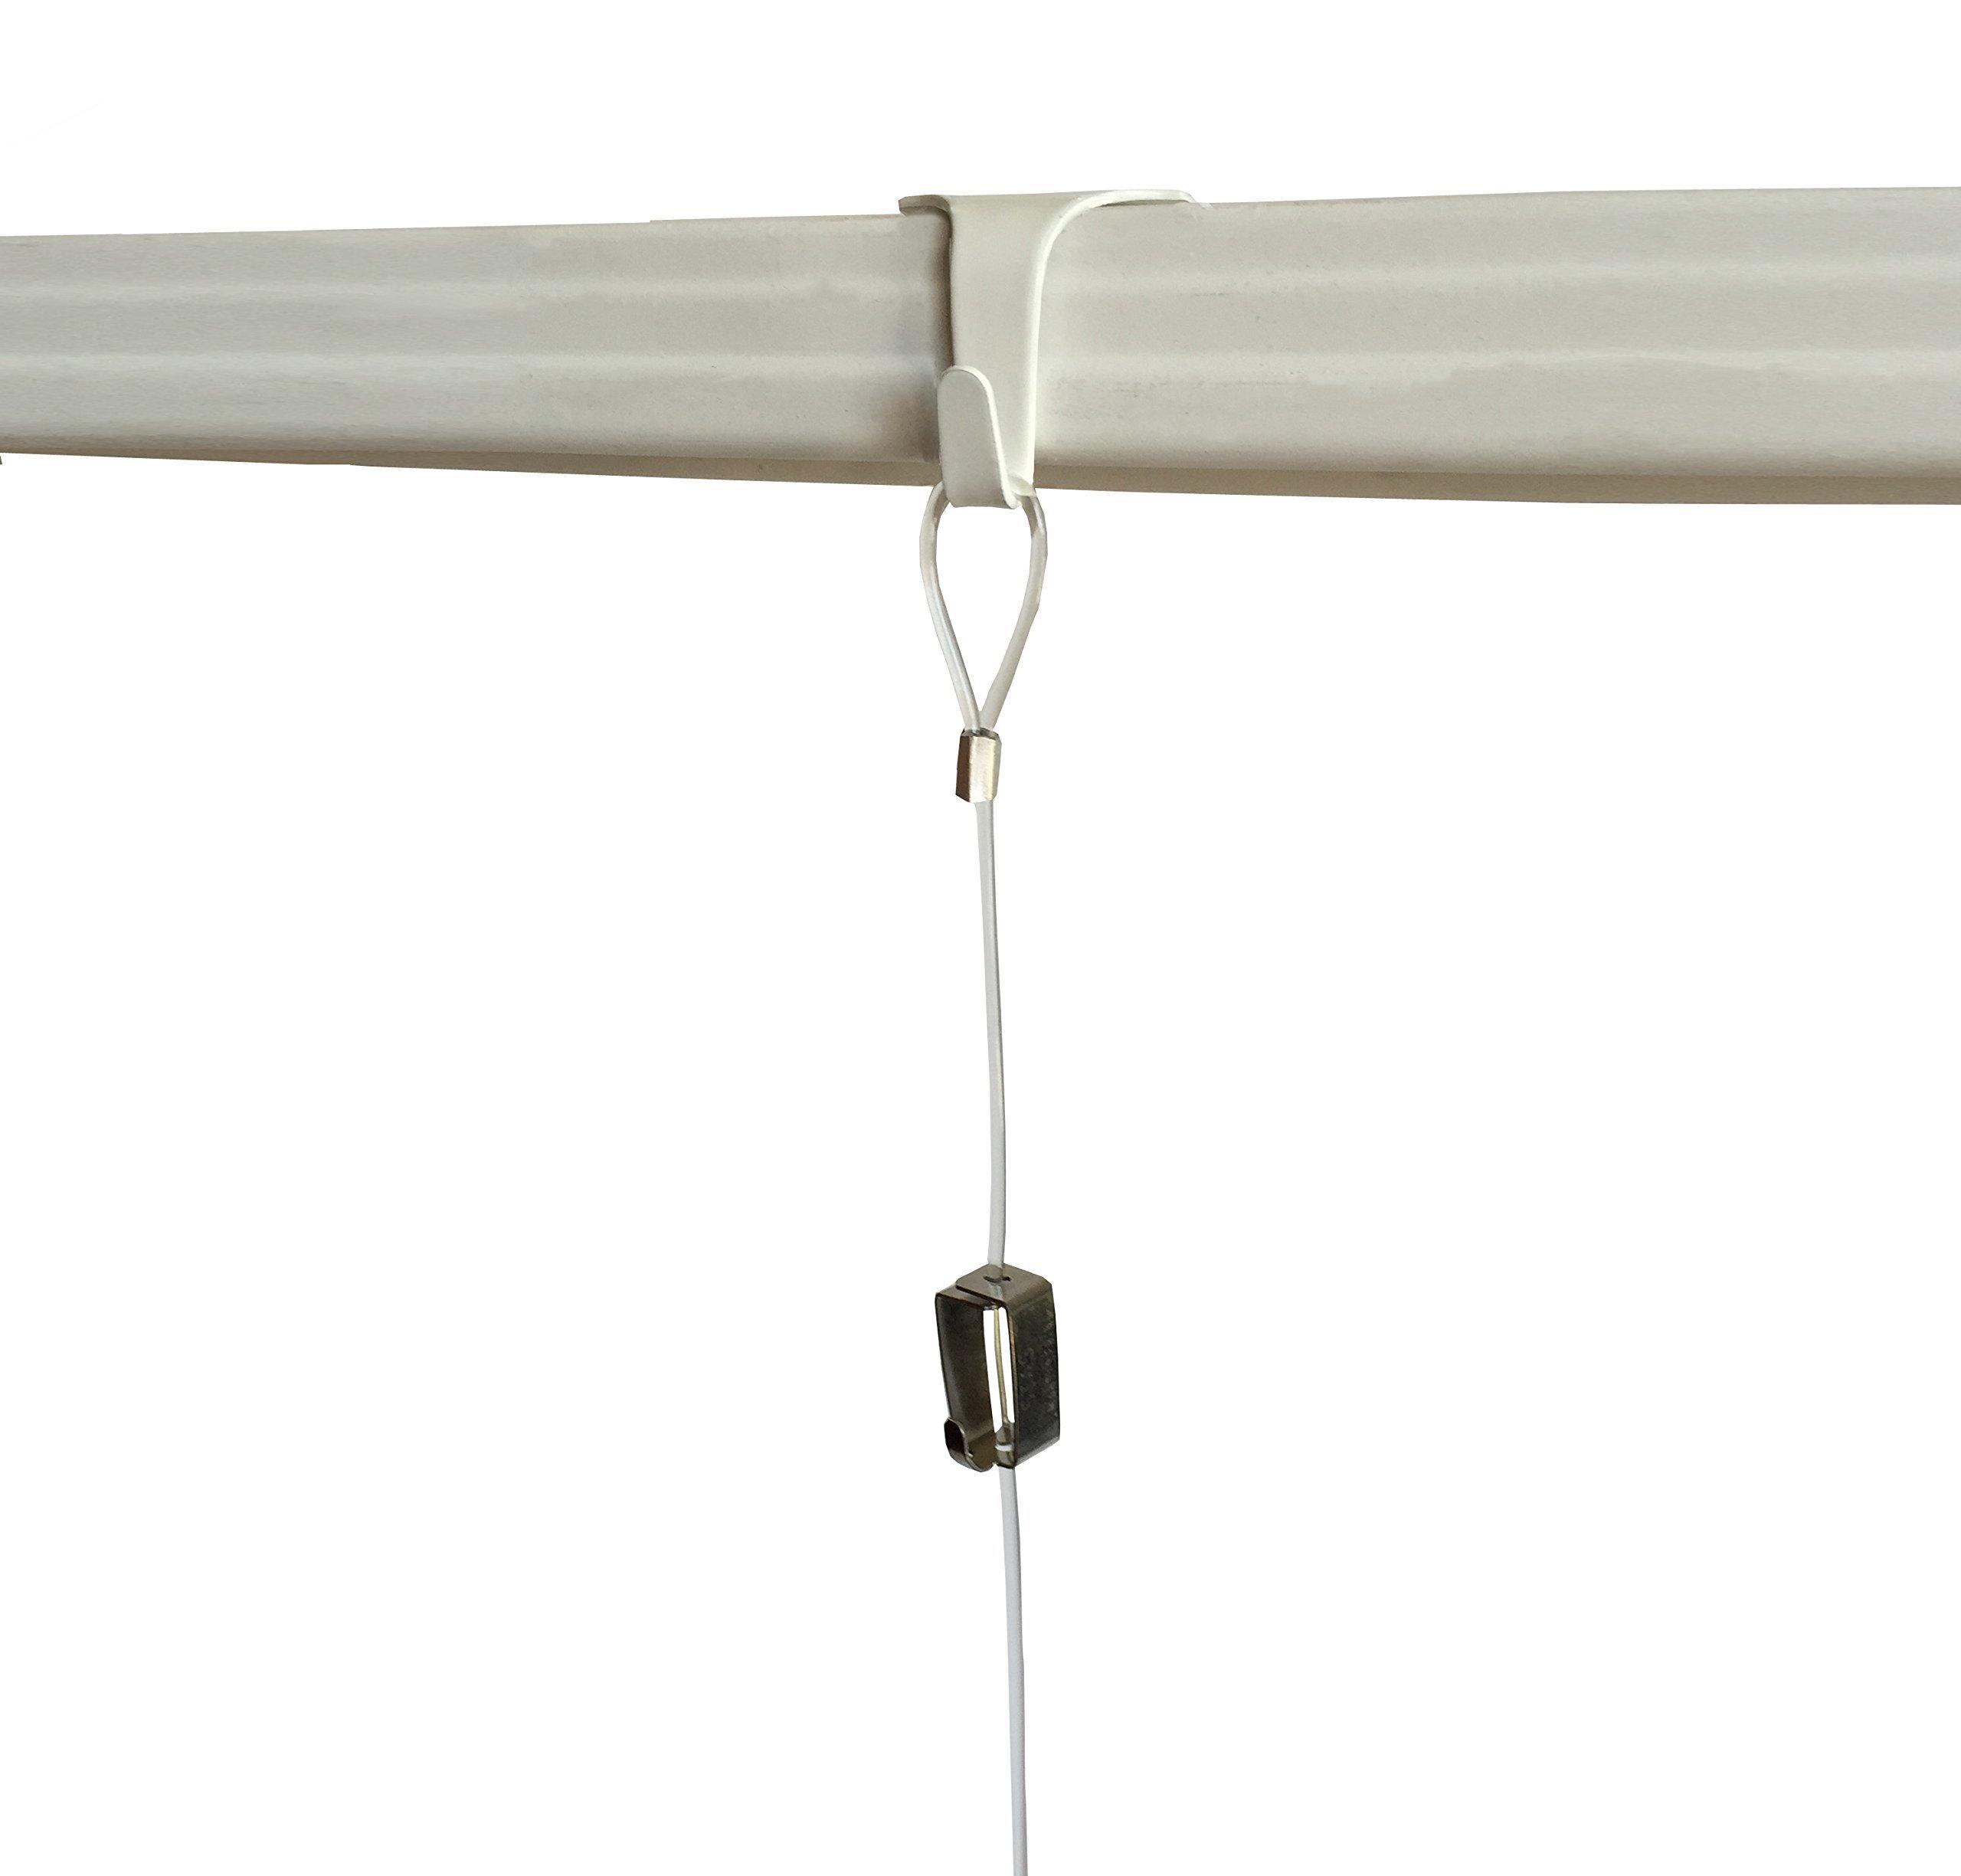 10 Pack each STAS Moulding Hooks + Perlon Cords with Loop + Smartspring Hooks (59'' perlon cord, White)